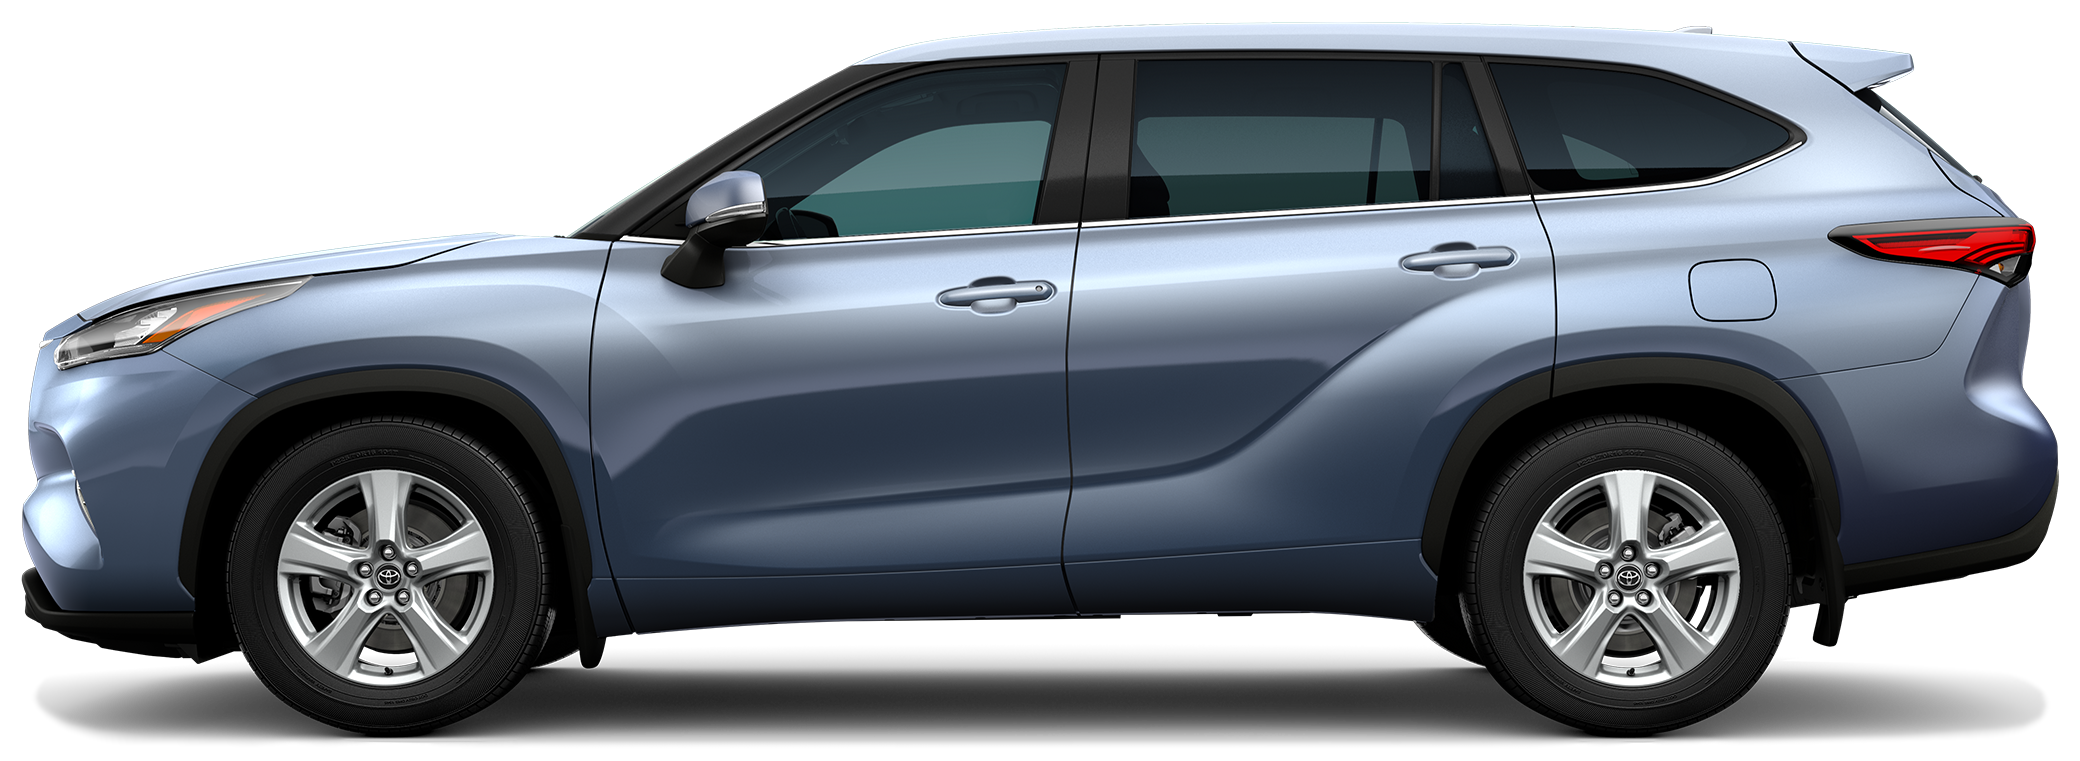 2020 Toyota Highlander Suv In Johnstown